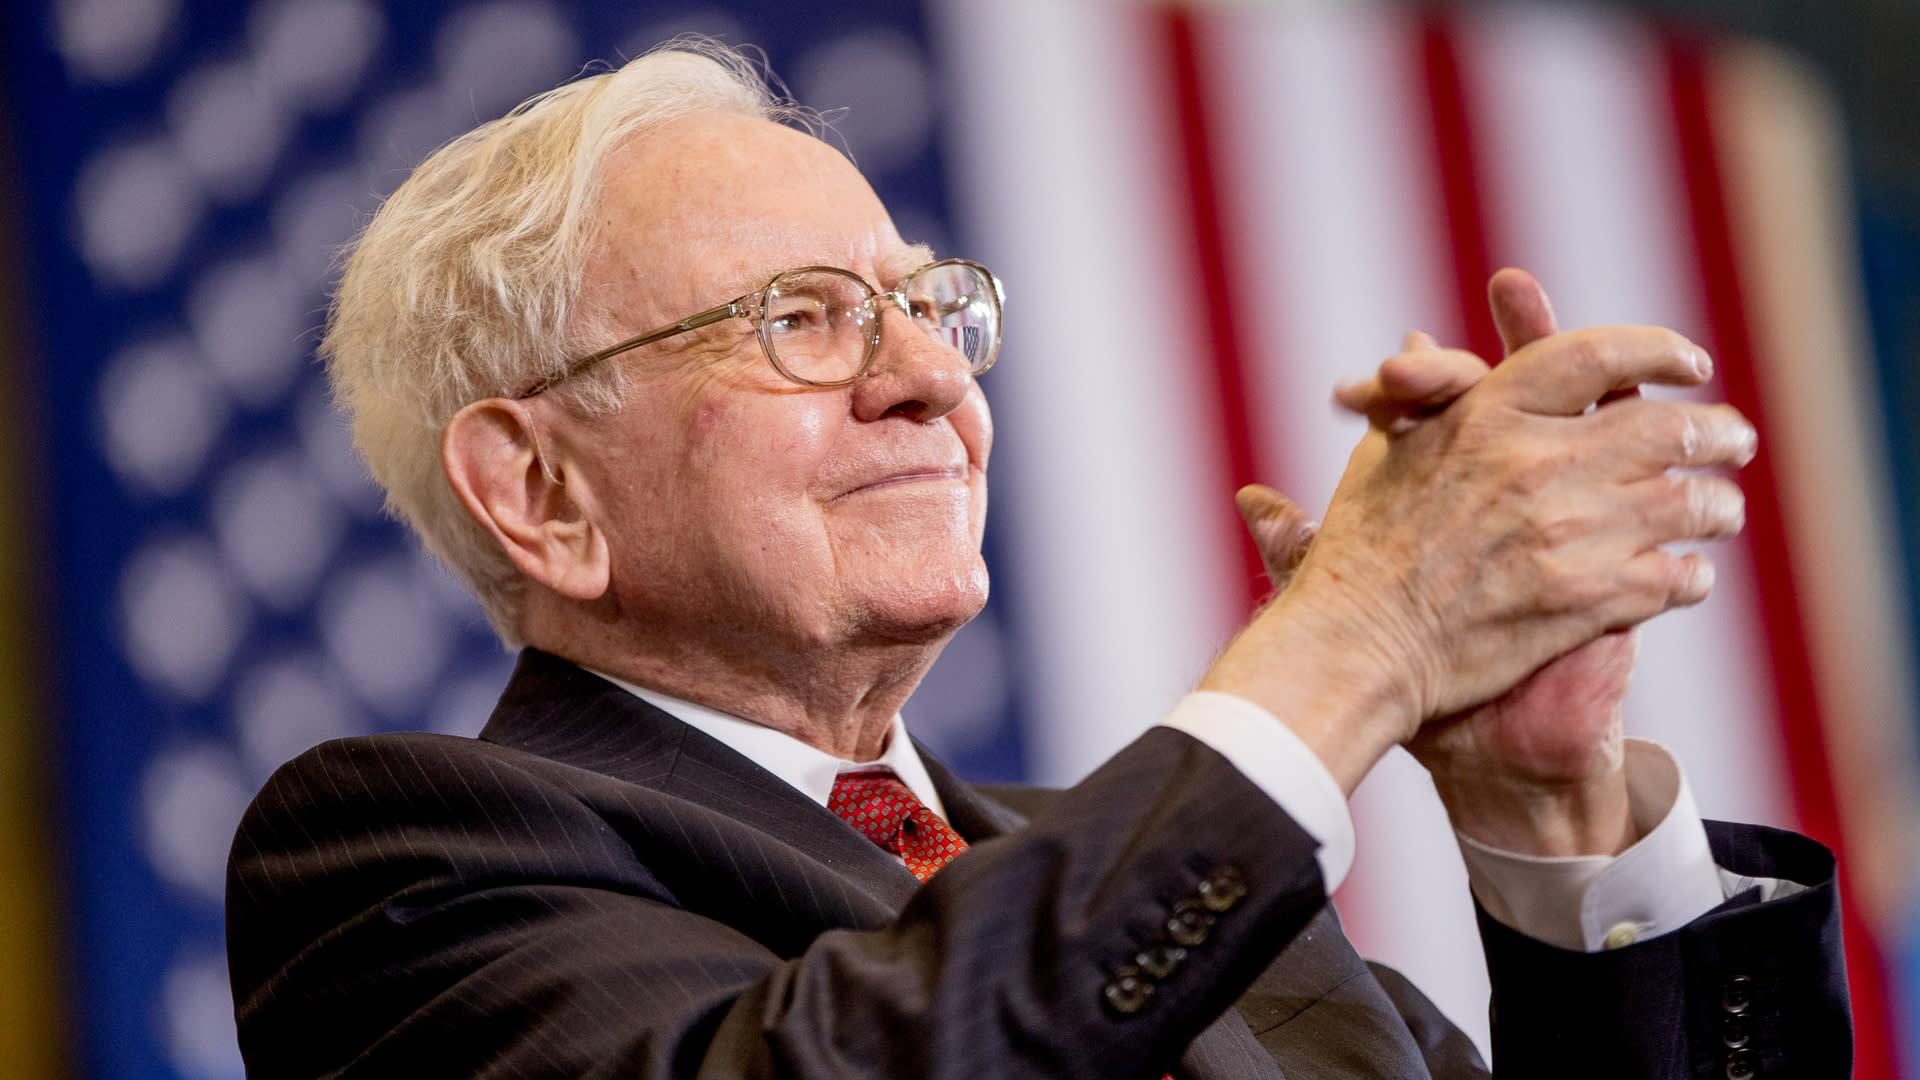 The First Jobs of Billionaires Like Warren Buffett and Jeff Bezos